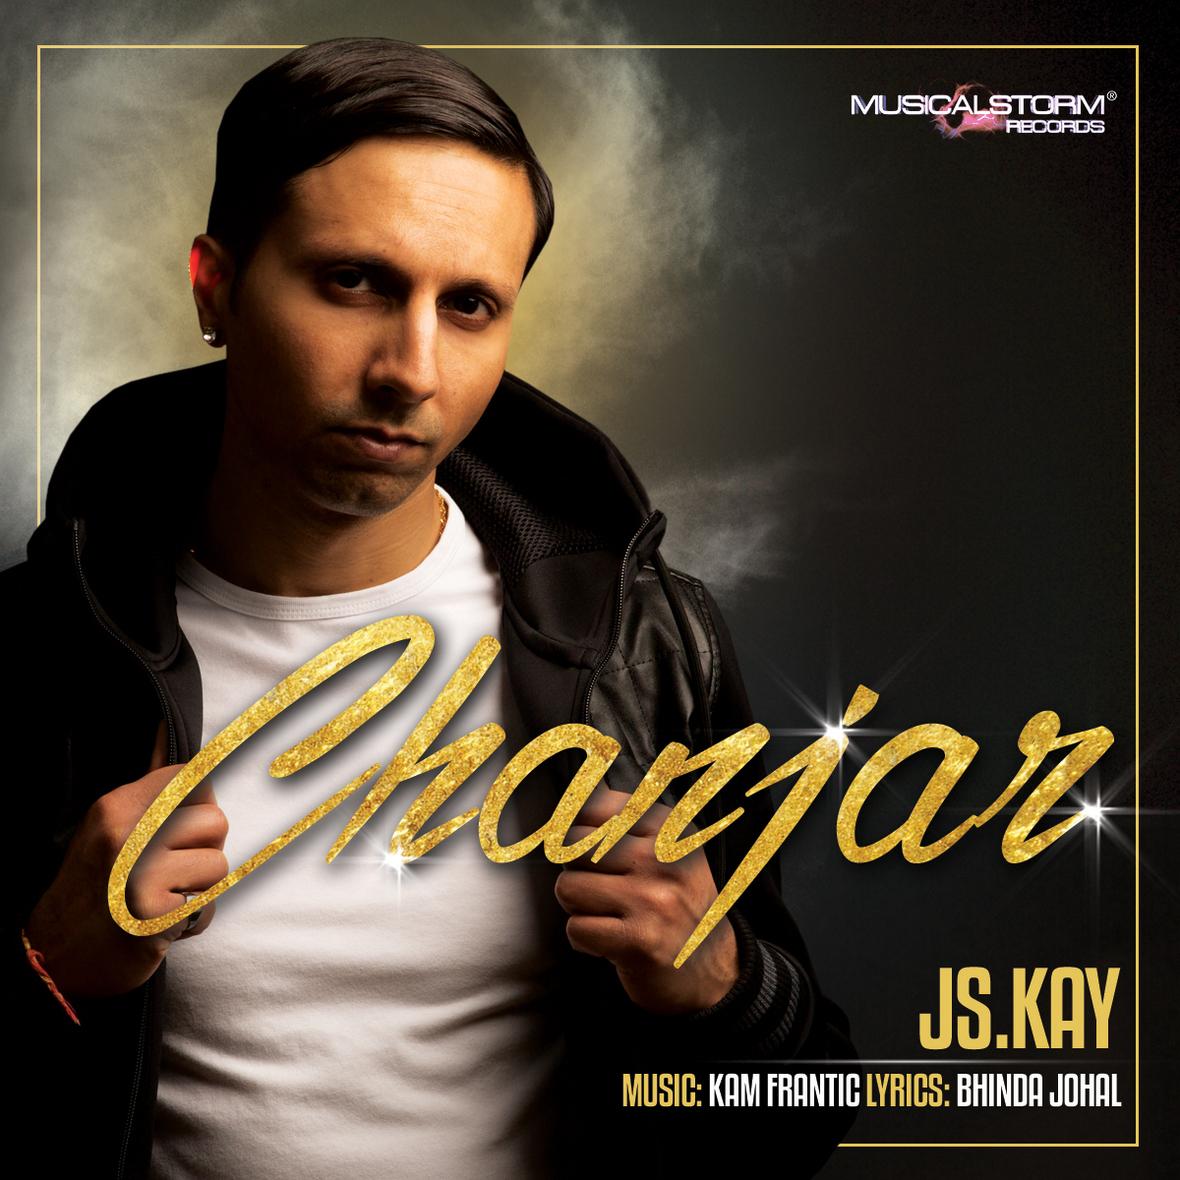 JS Kay